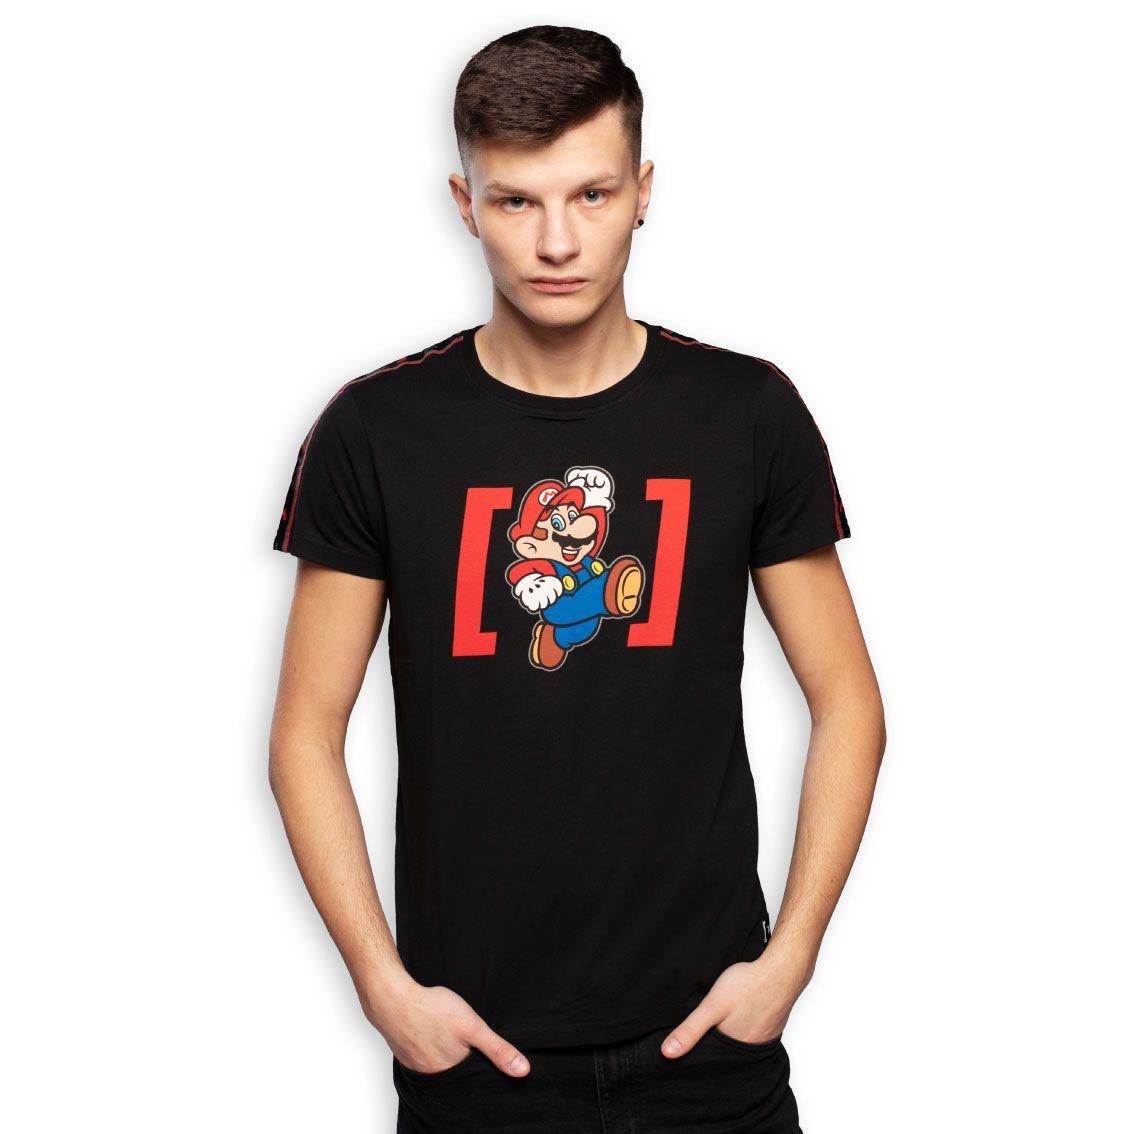 T-shirt homme super mario (photo)